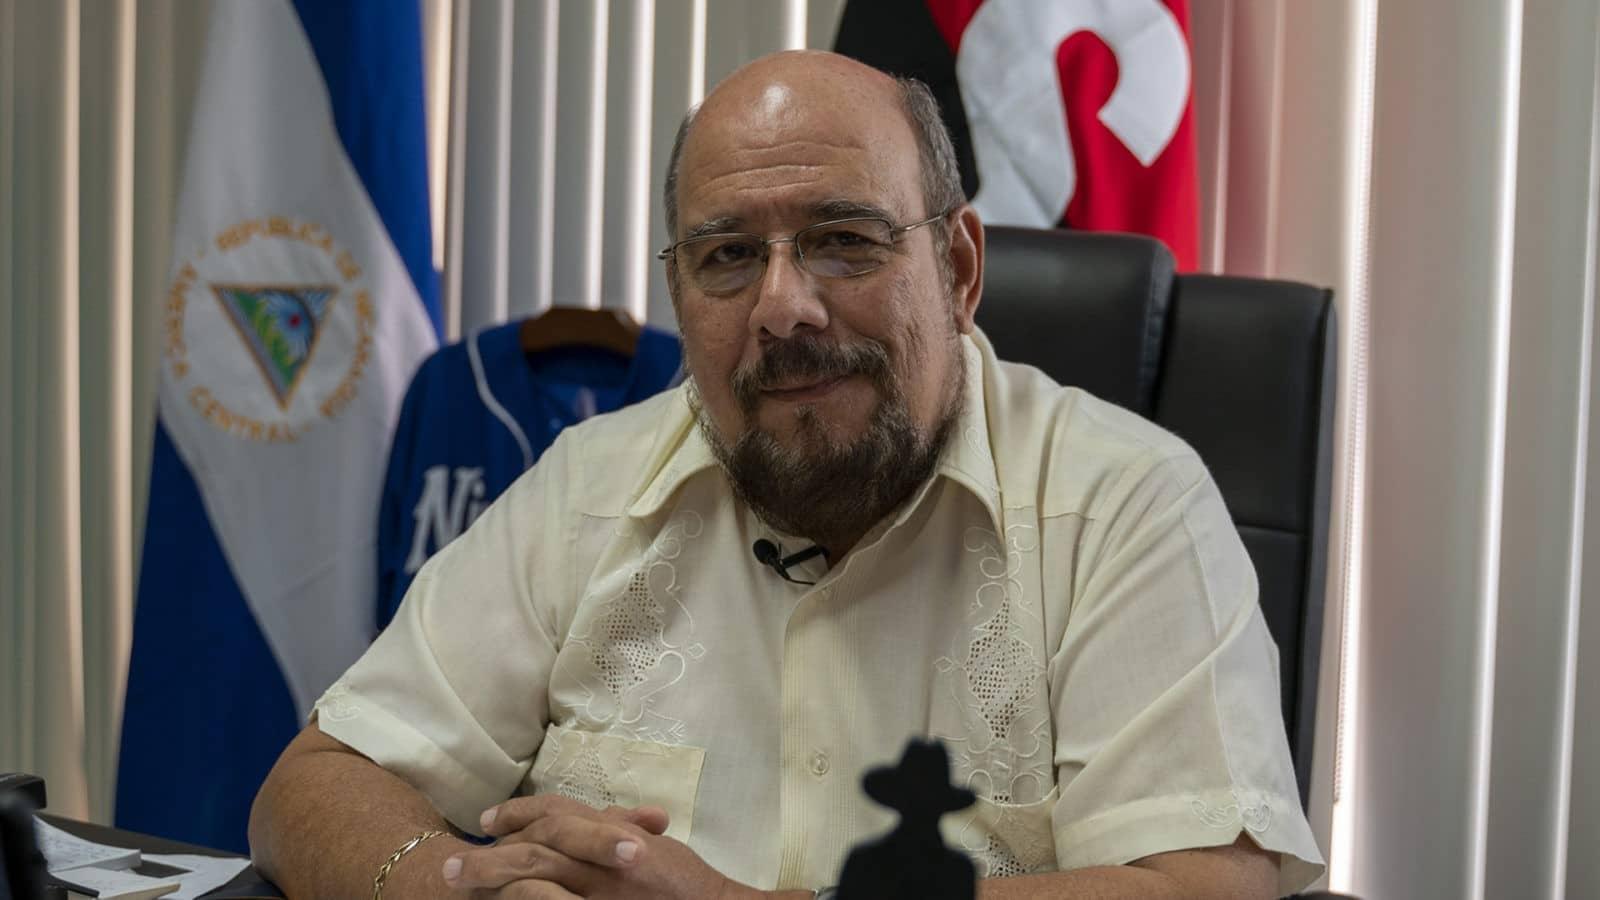 Edwin-Castro-FSLN-Nicaragua-Amnesty-law-Grayzone-Ben-Norton